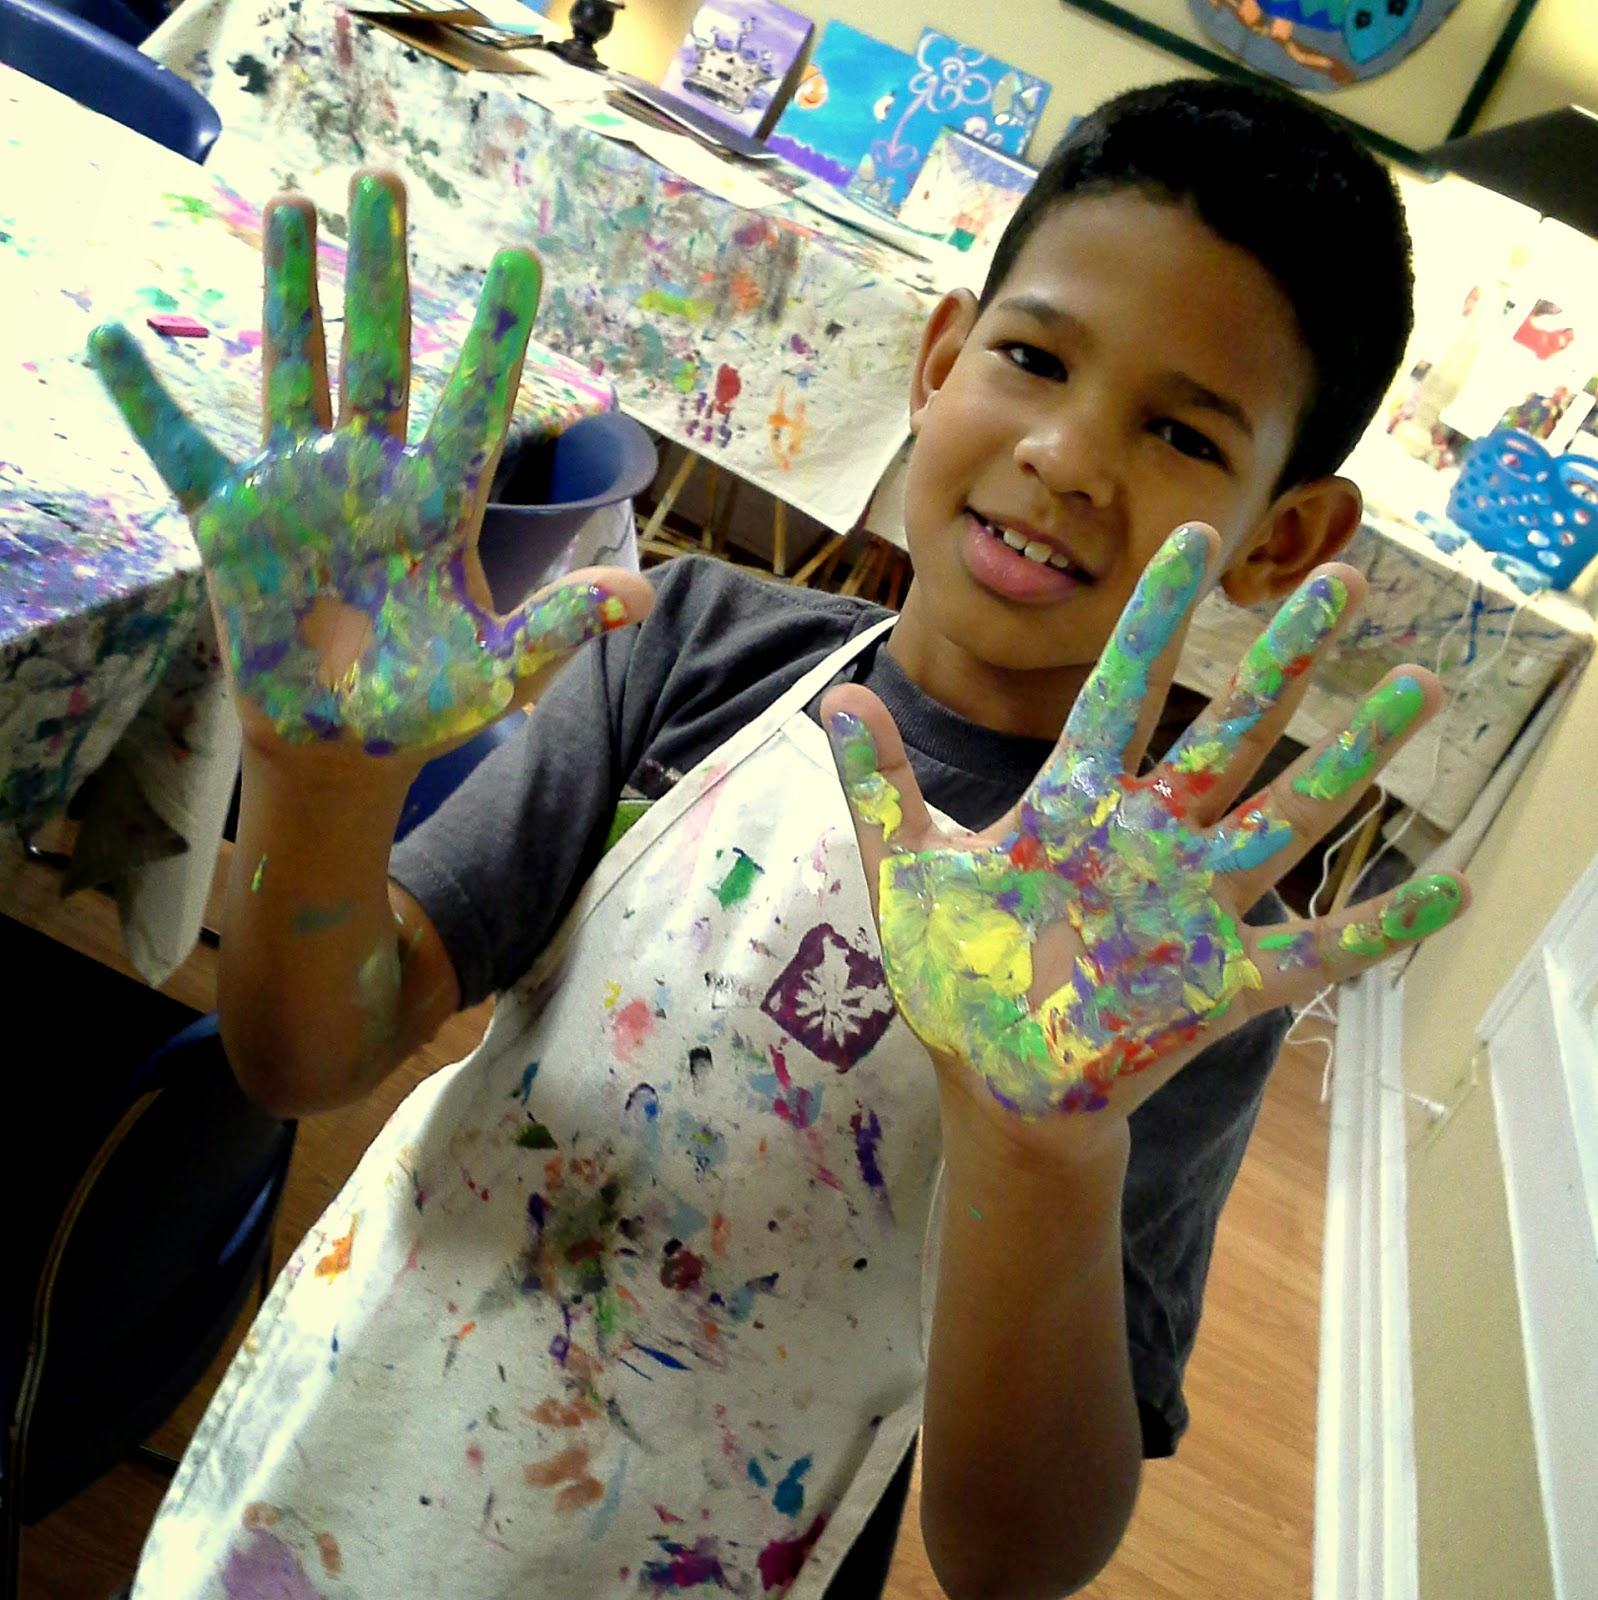 http://www.ajsartstudio.com/krafty-kids.html